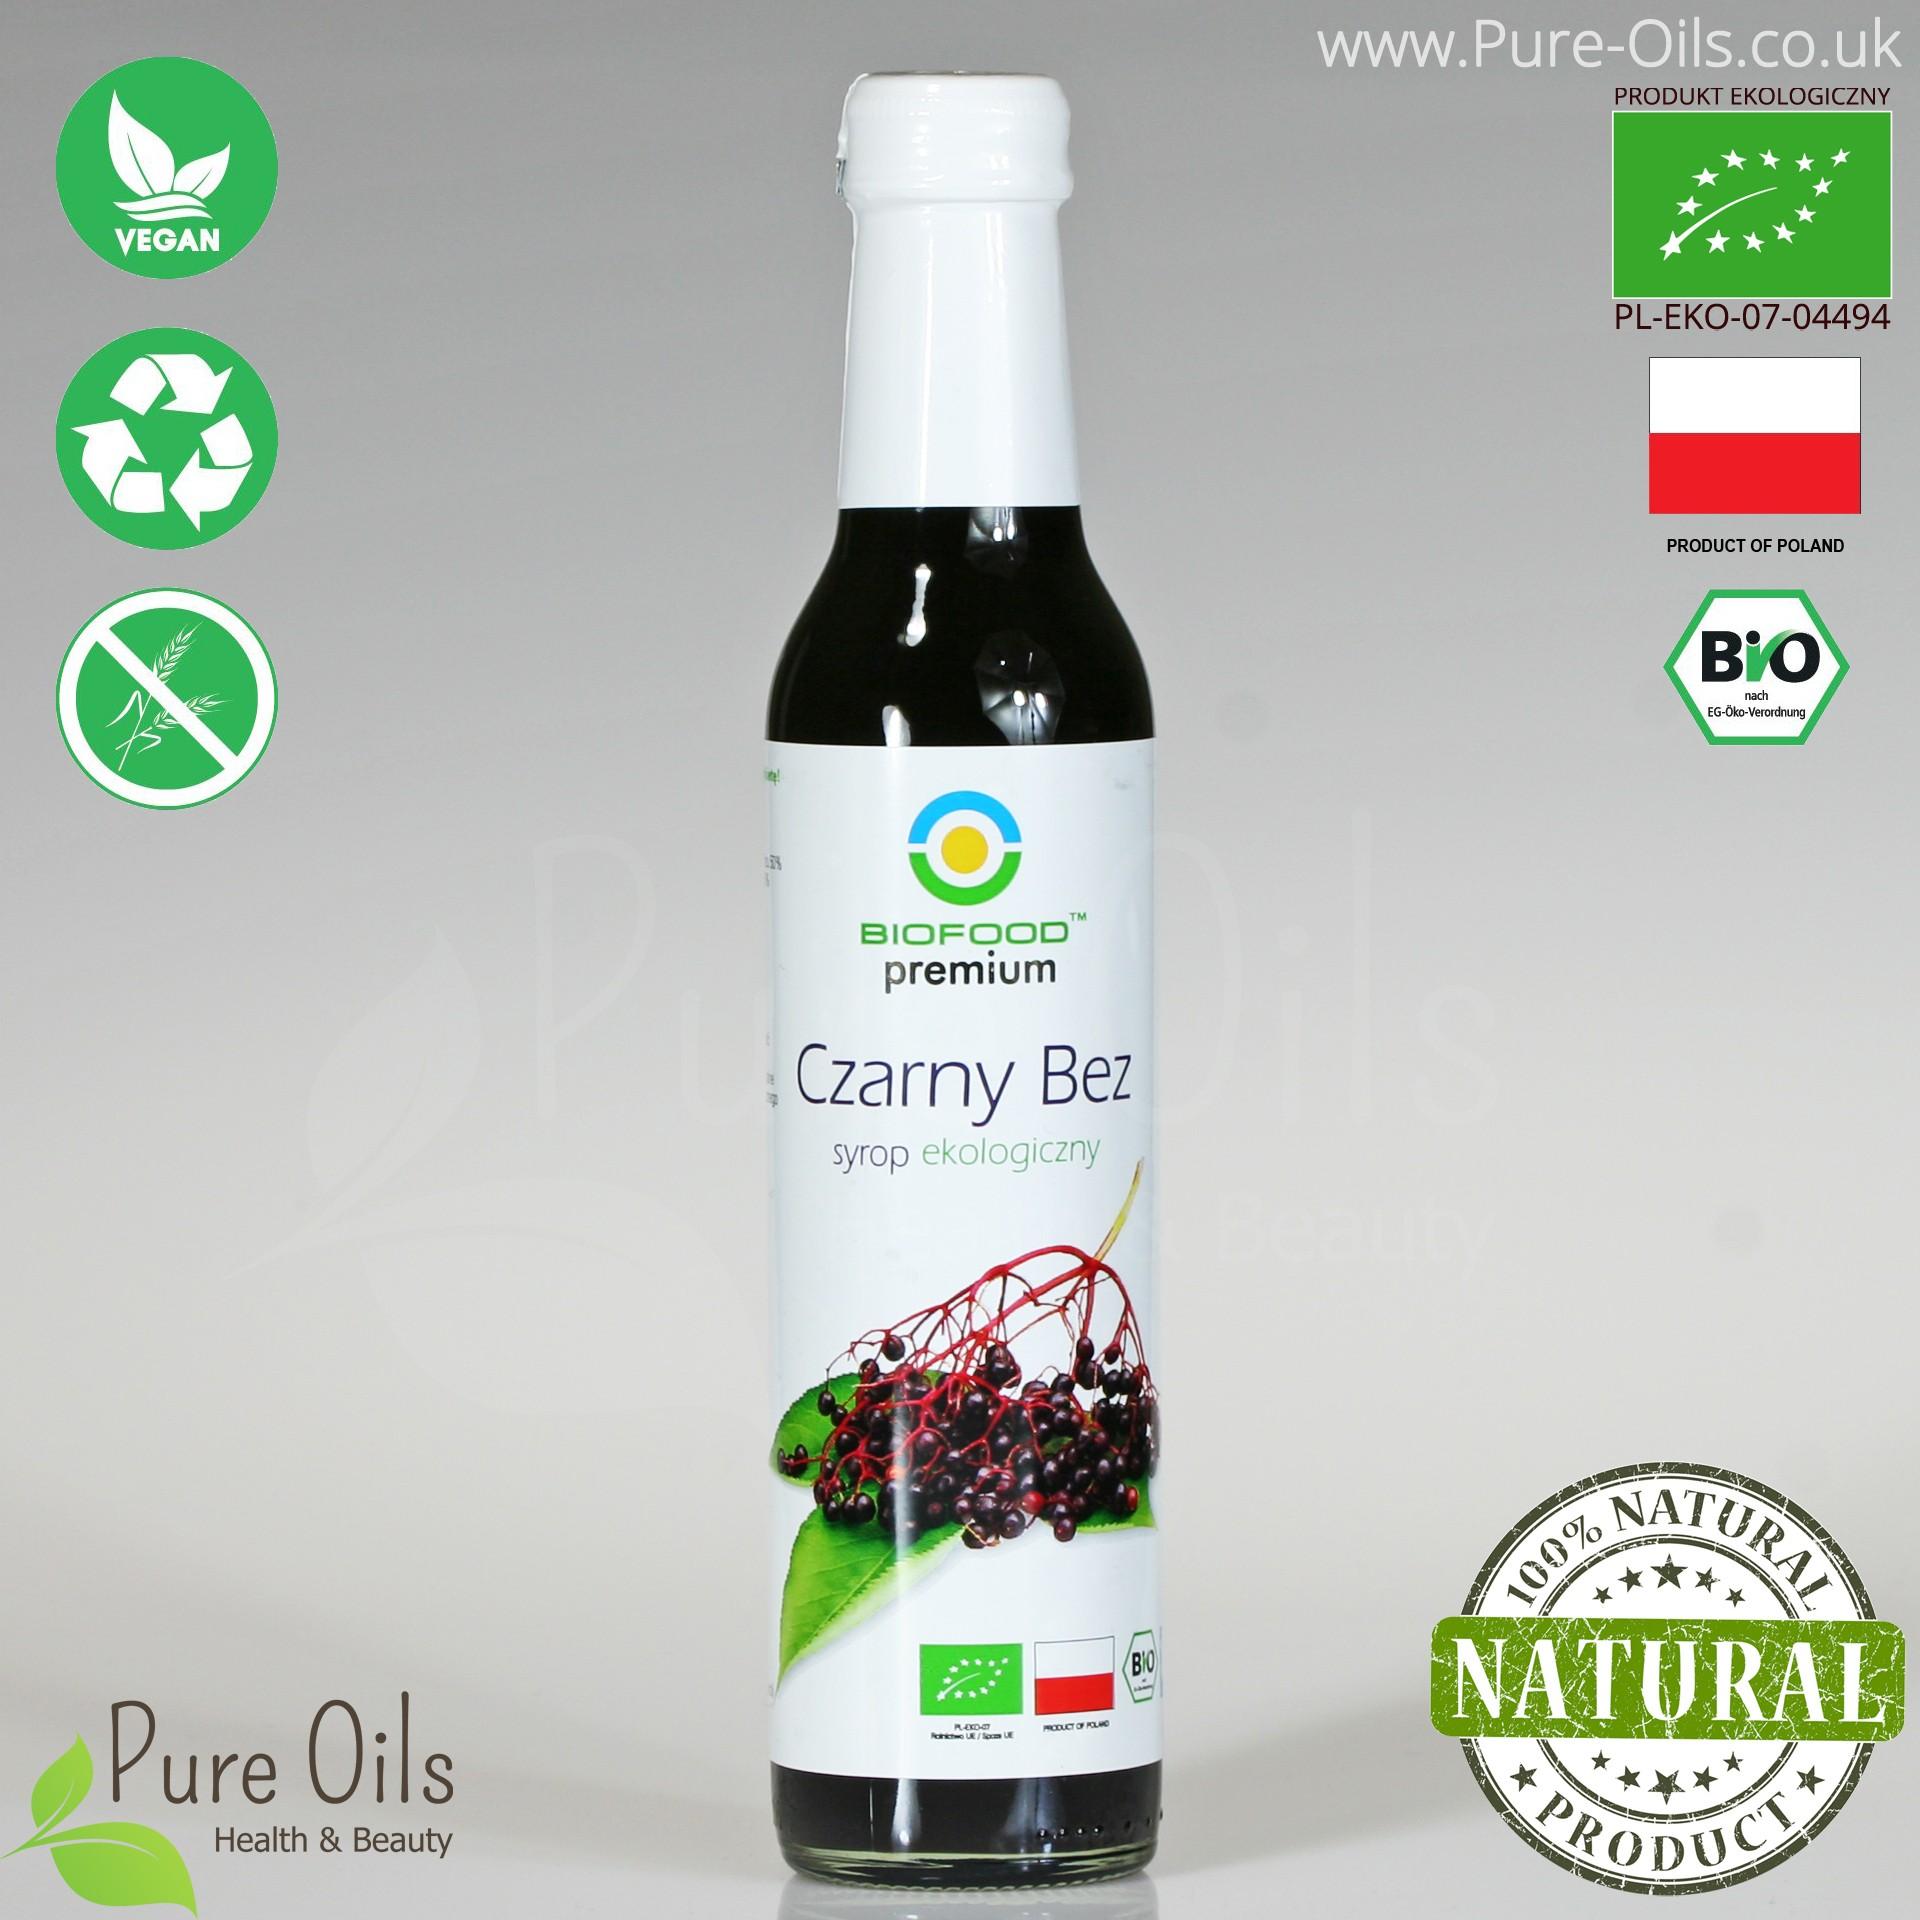 Elderberry Syrup - Organic, Biofood